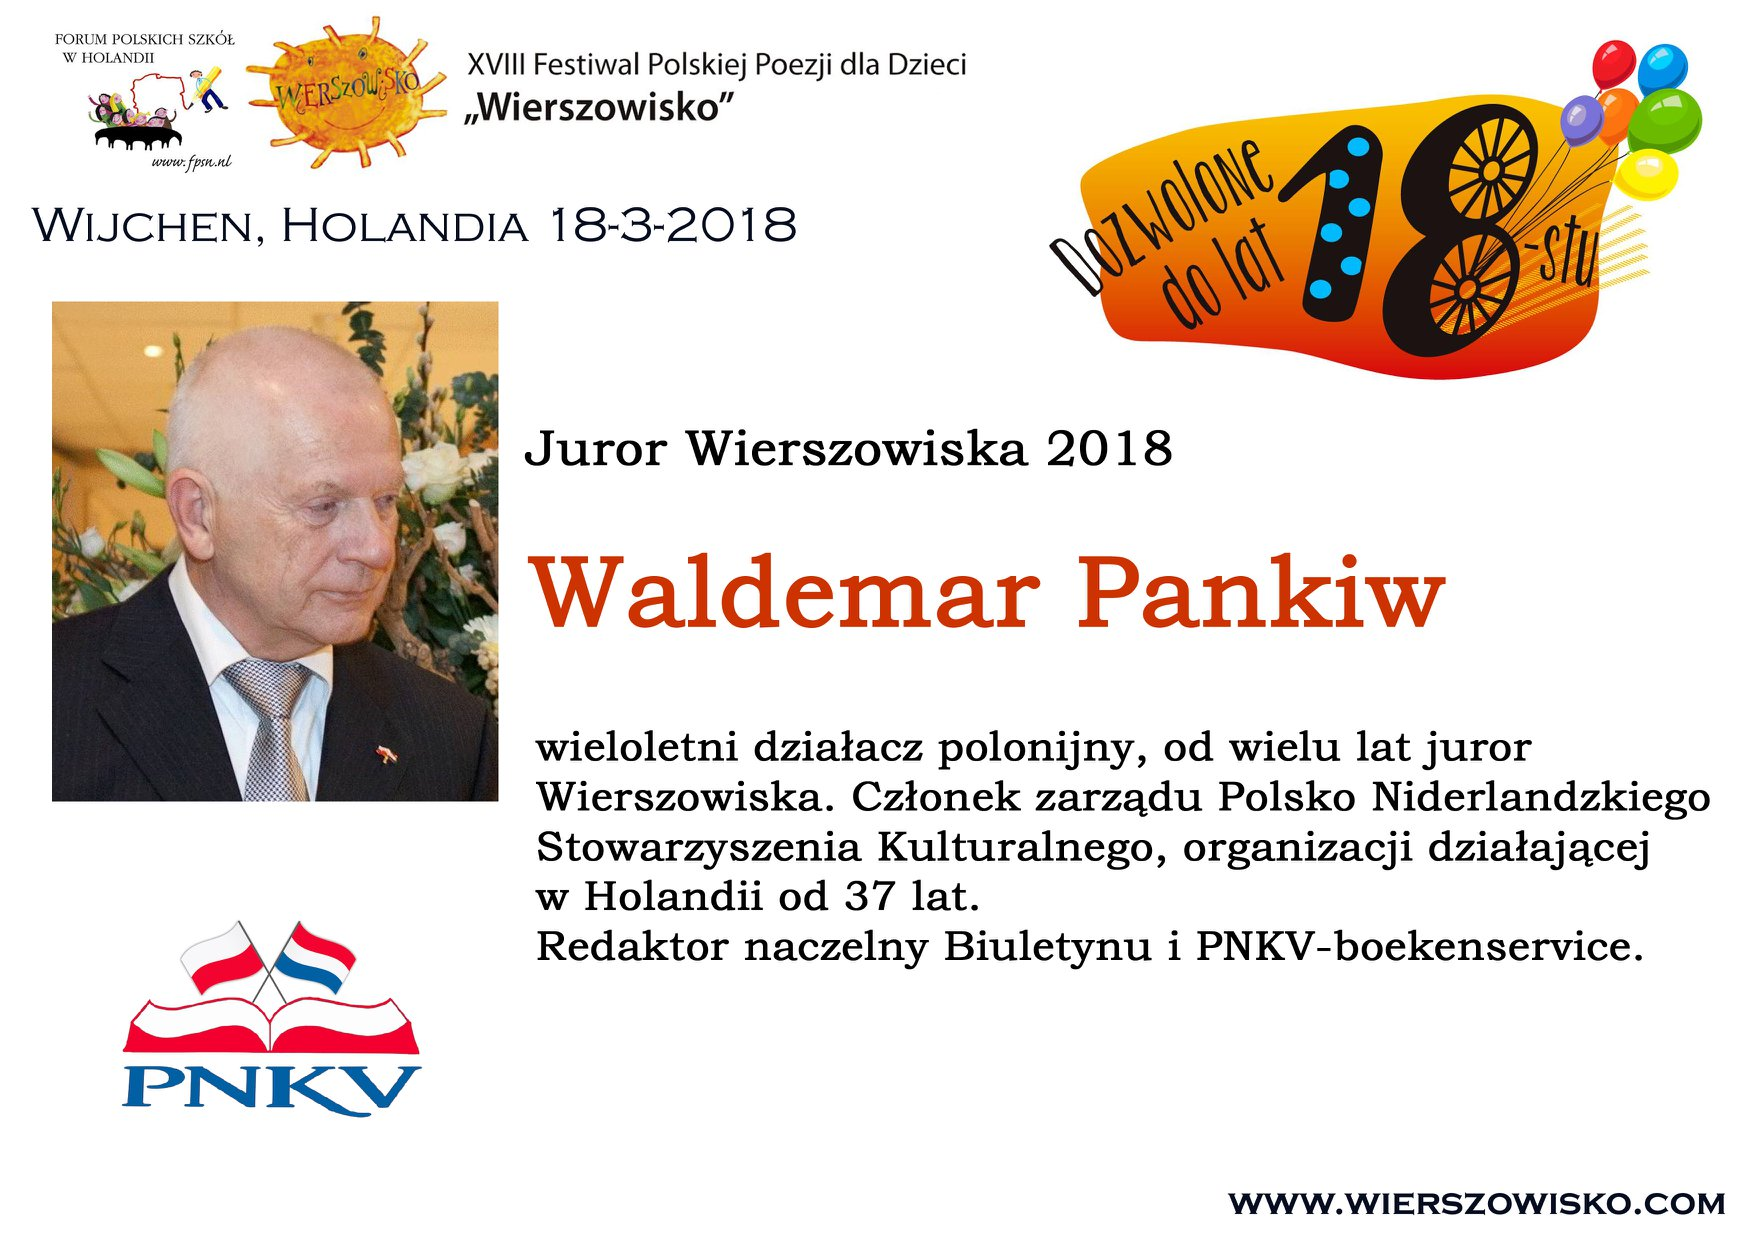 5 Waldemar Pankiw